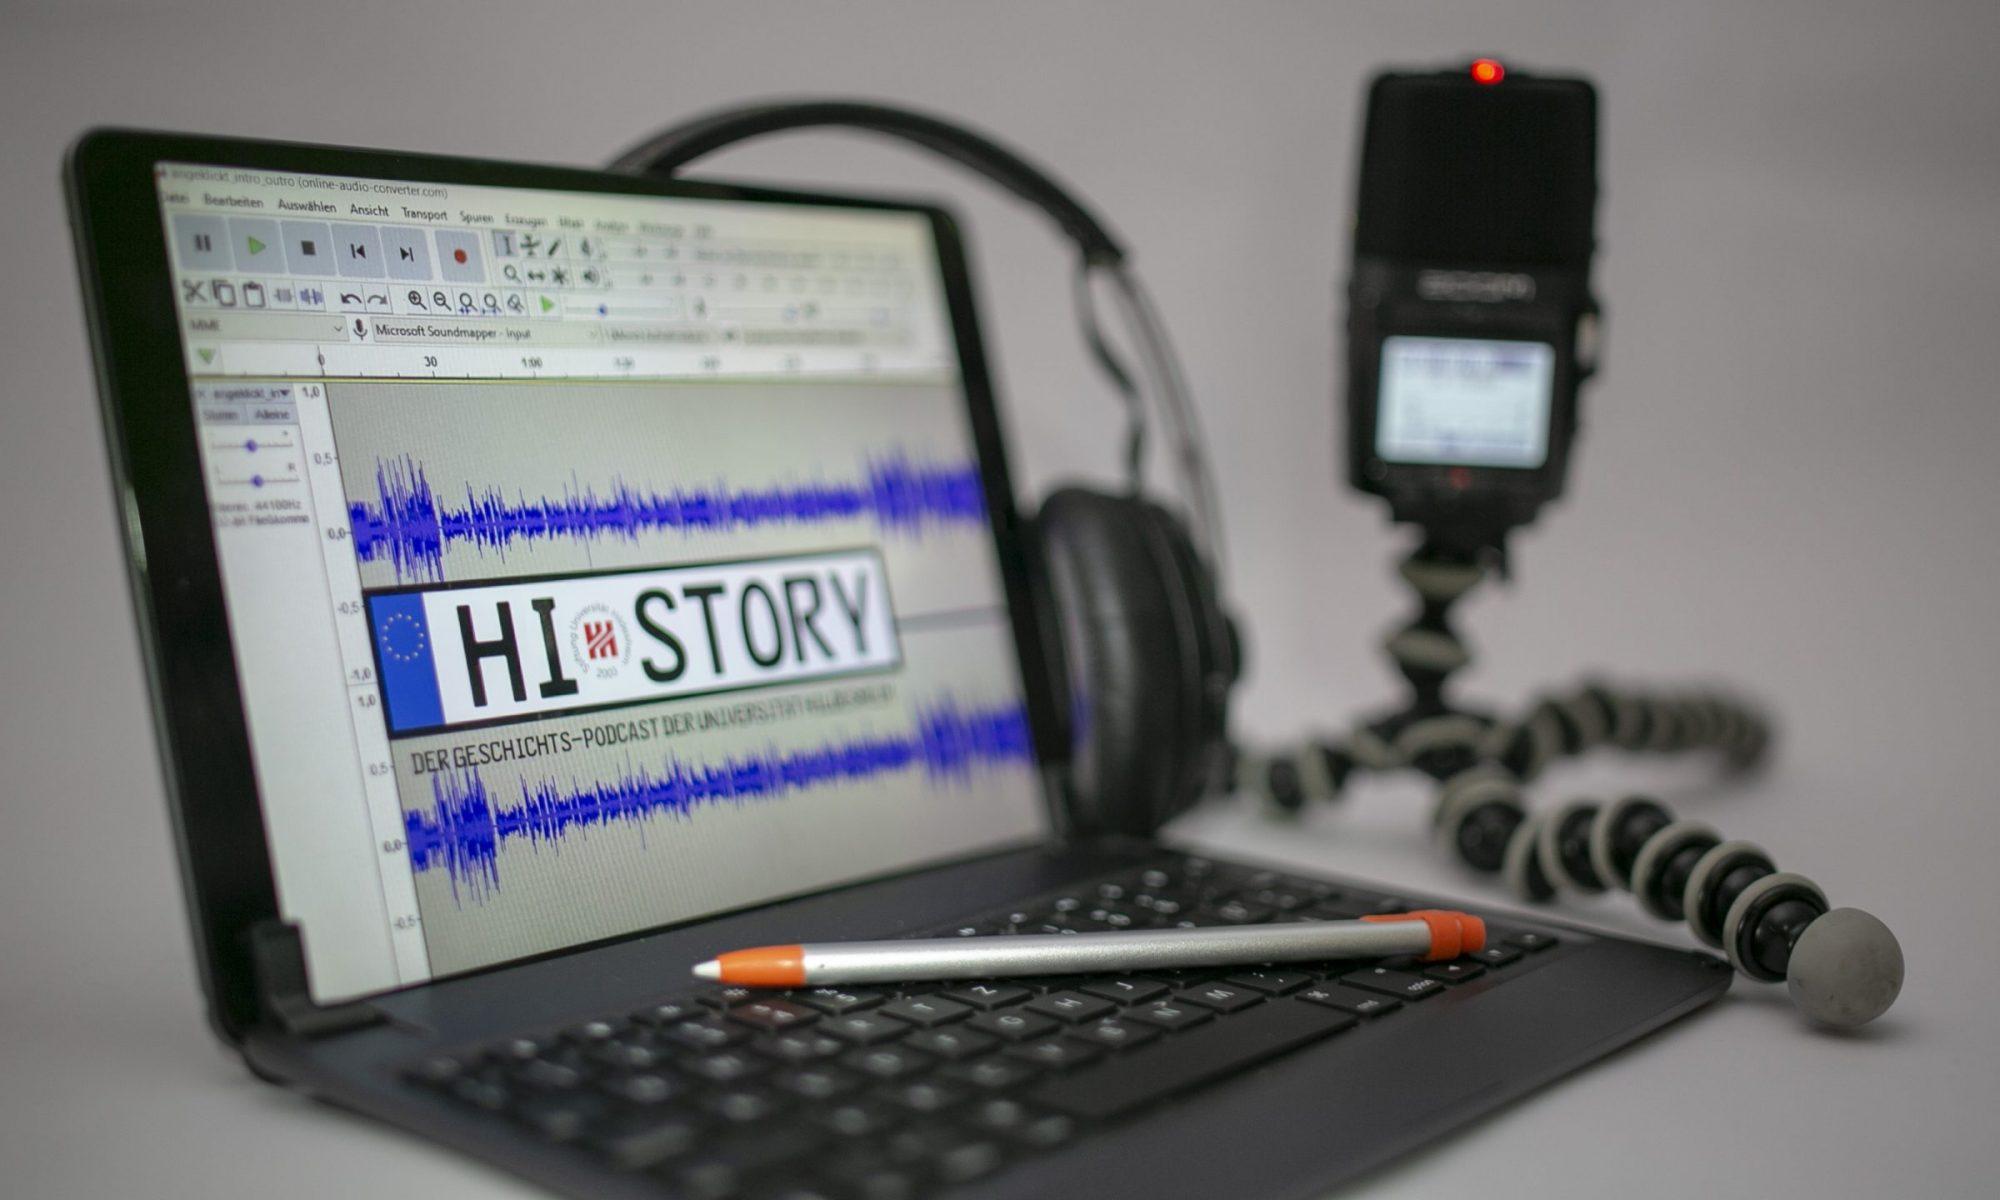 HI*story